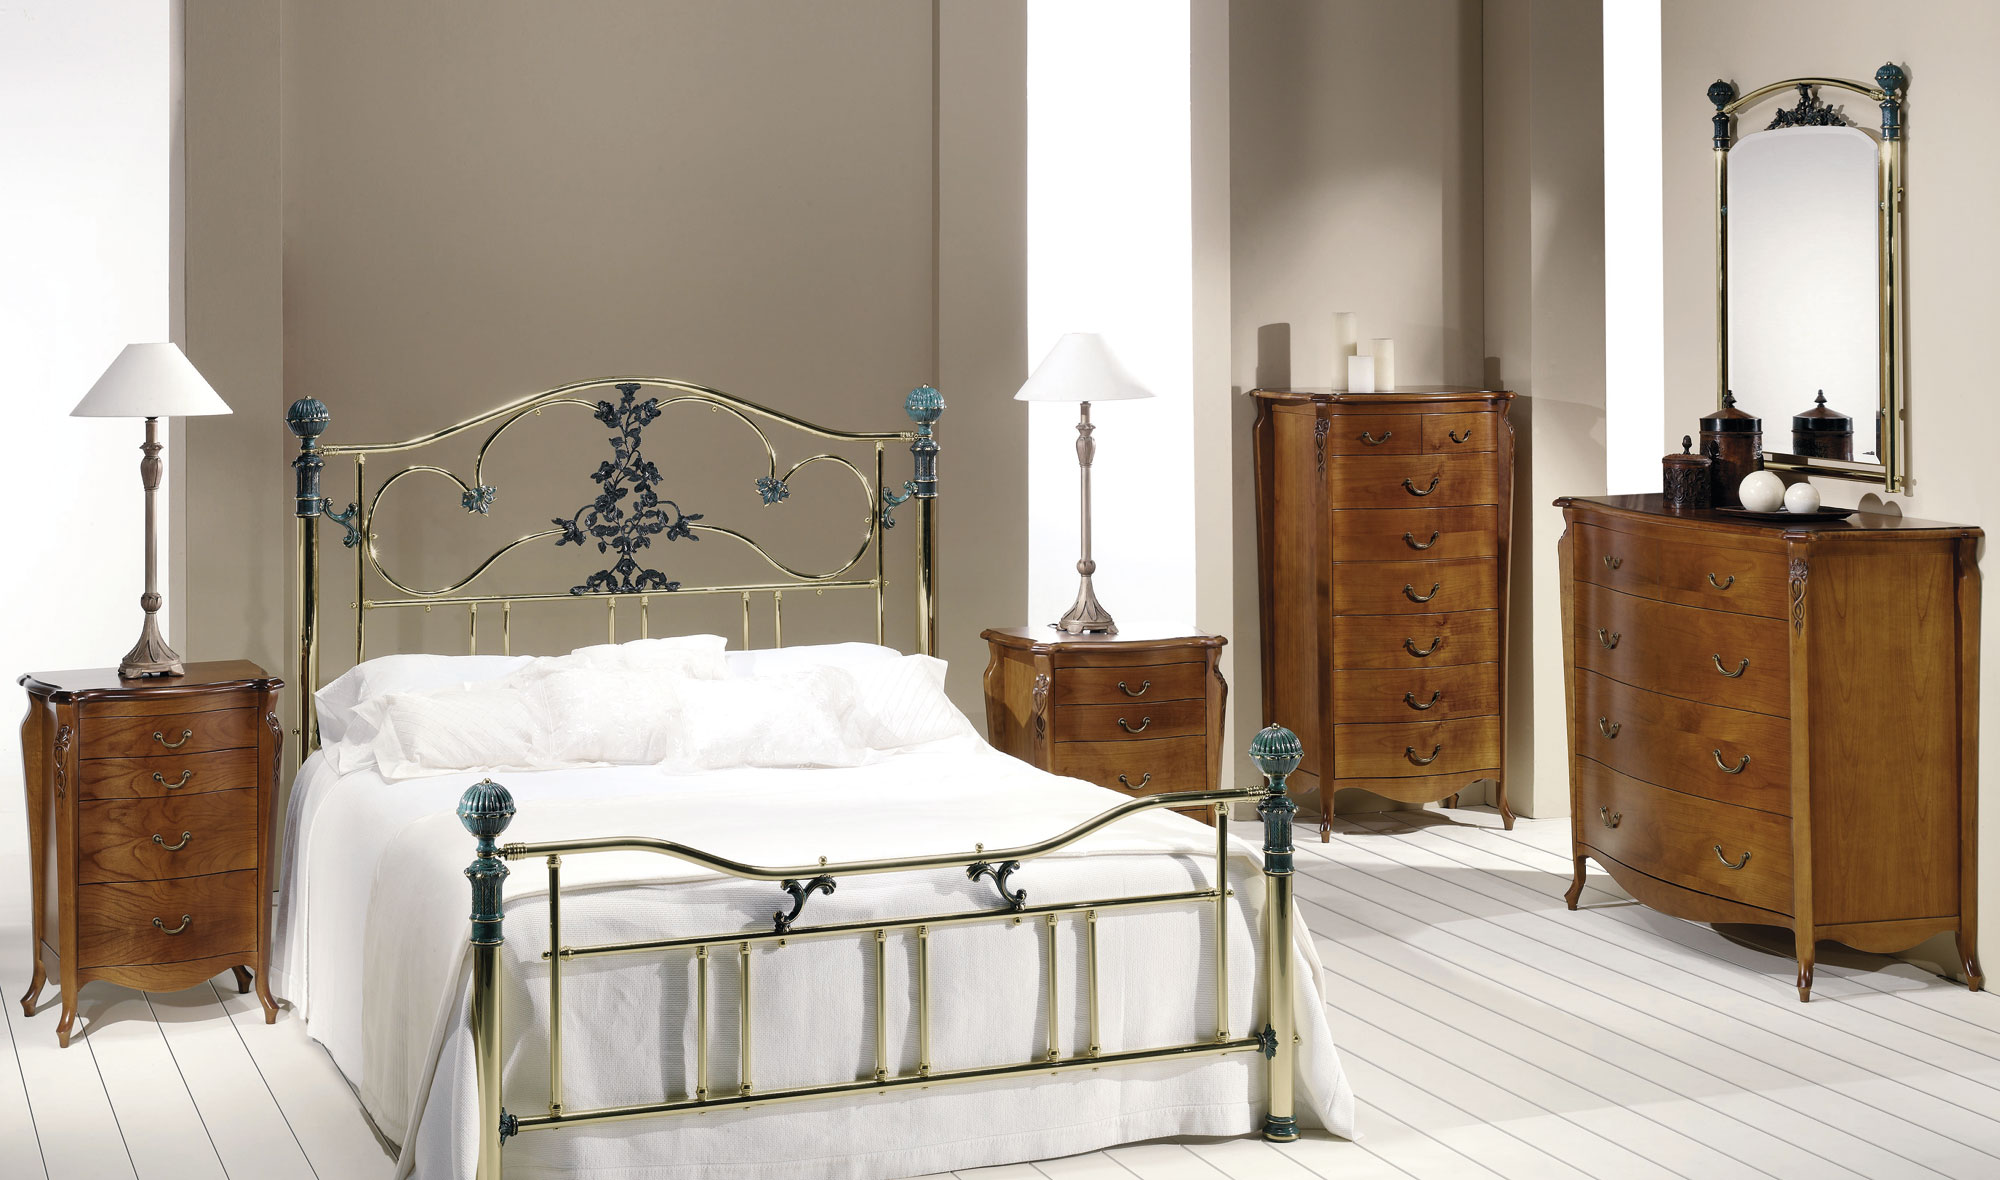 Dormitorio forja roxana en - Muebles en forja ...